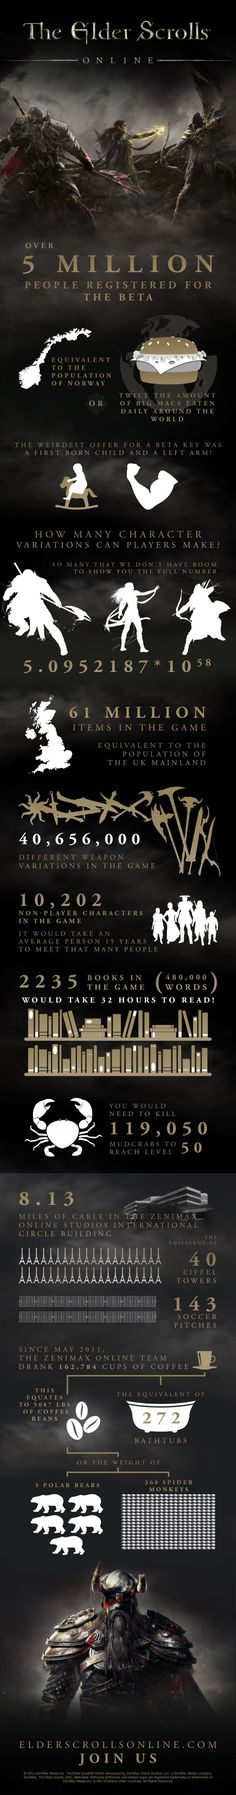 Elder Scrolls Online : Interesting Facts #infographic